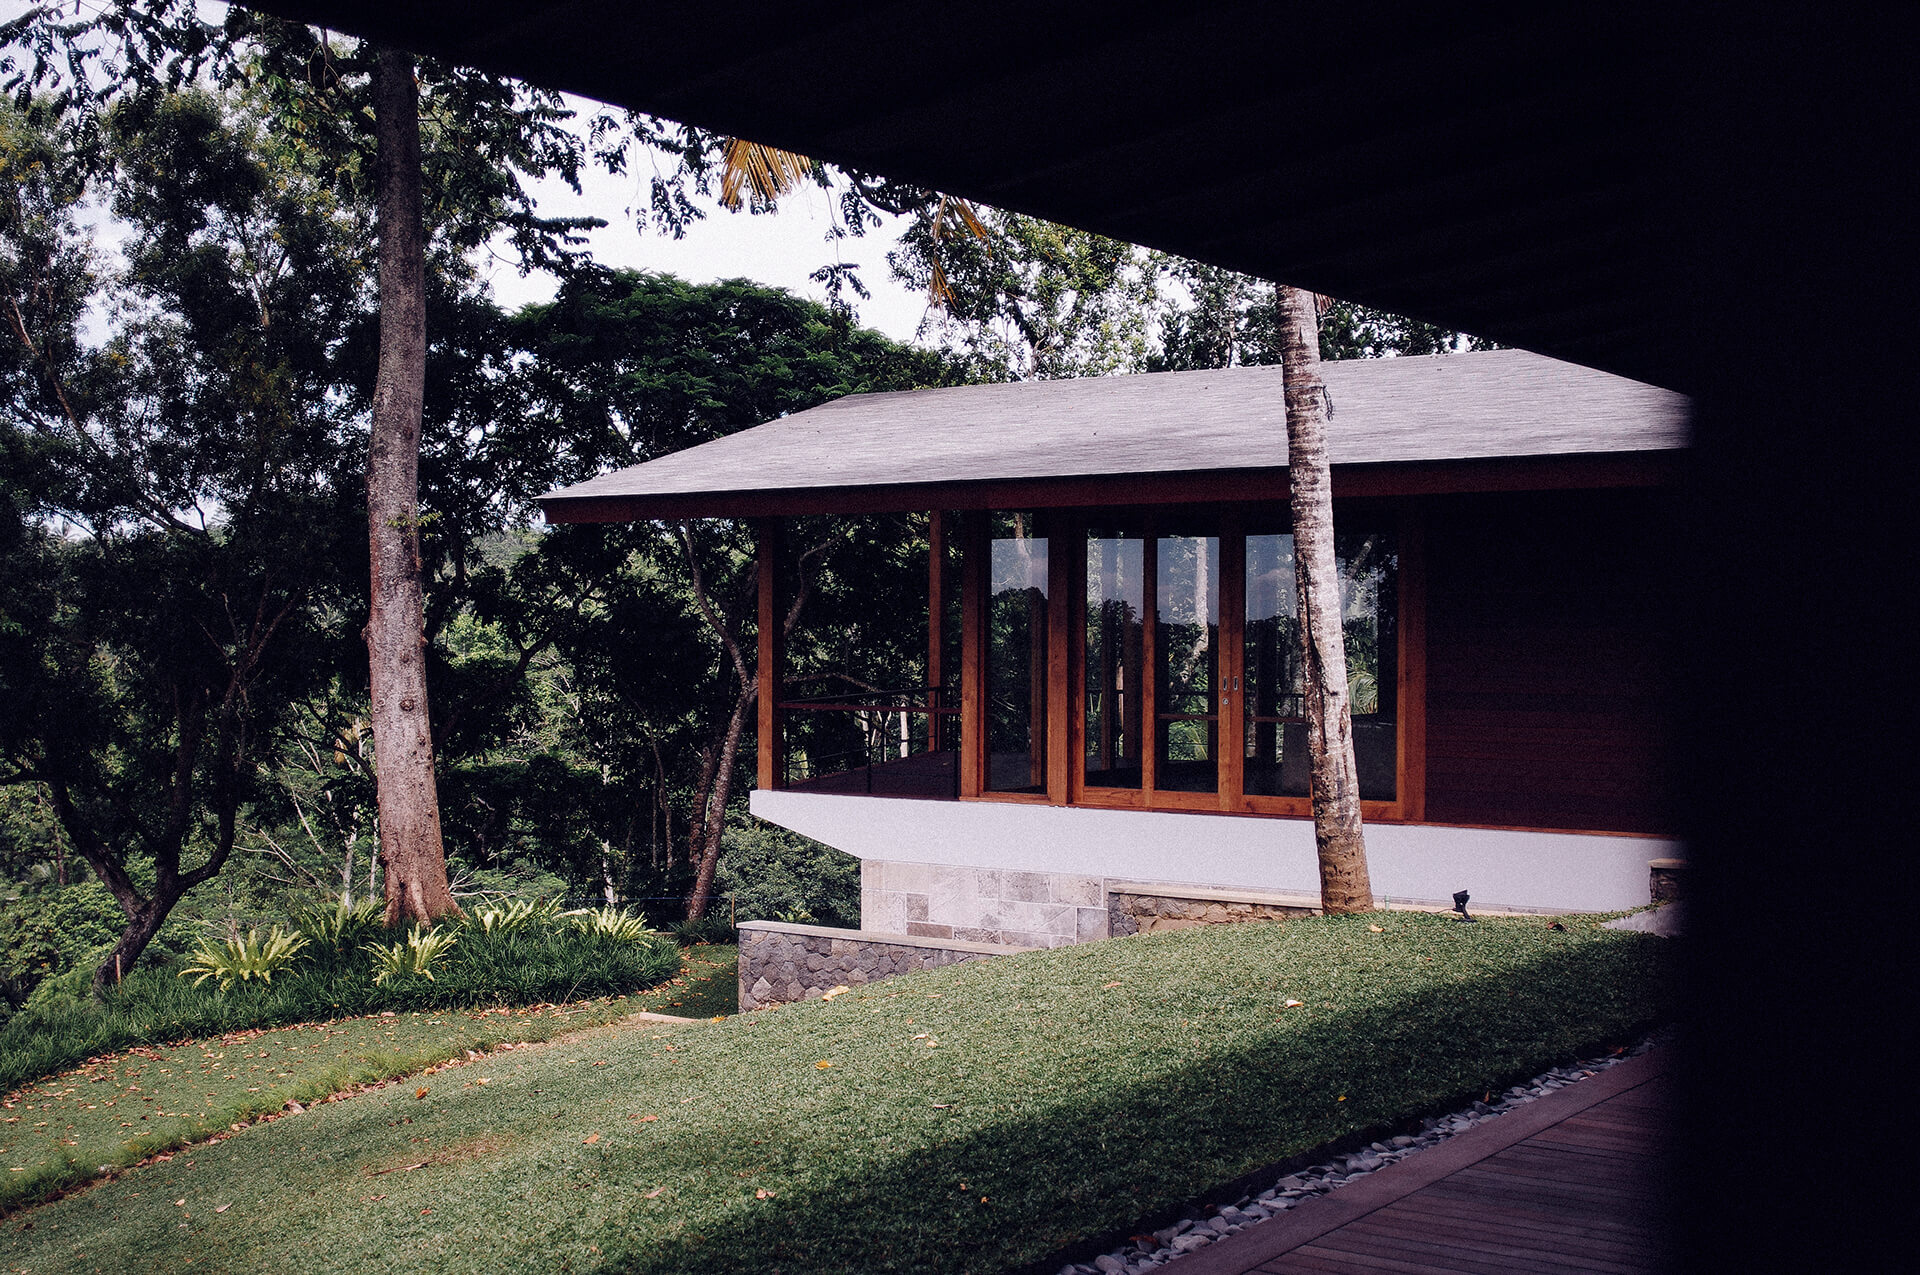 House in Payangan architect in Bali 01